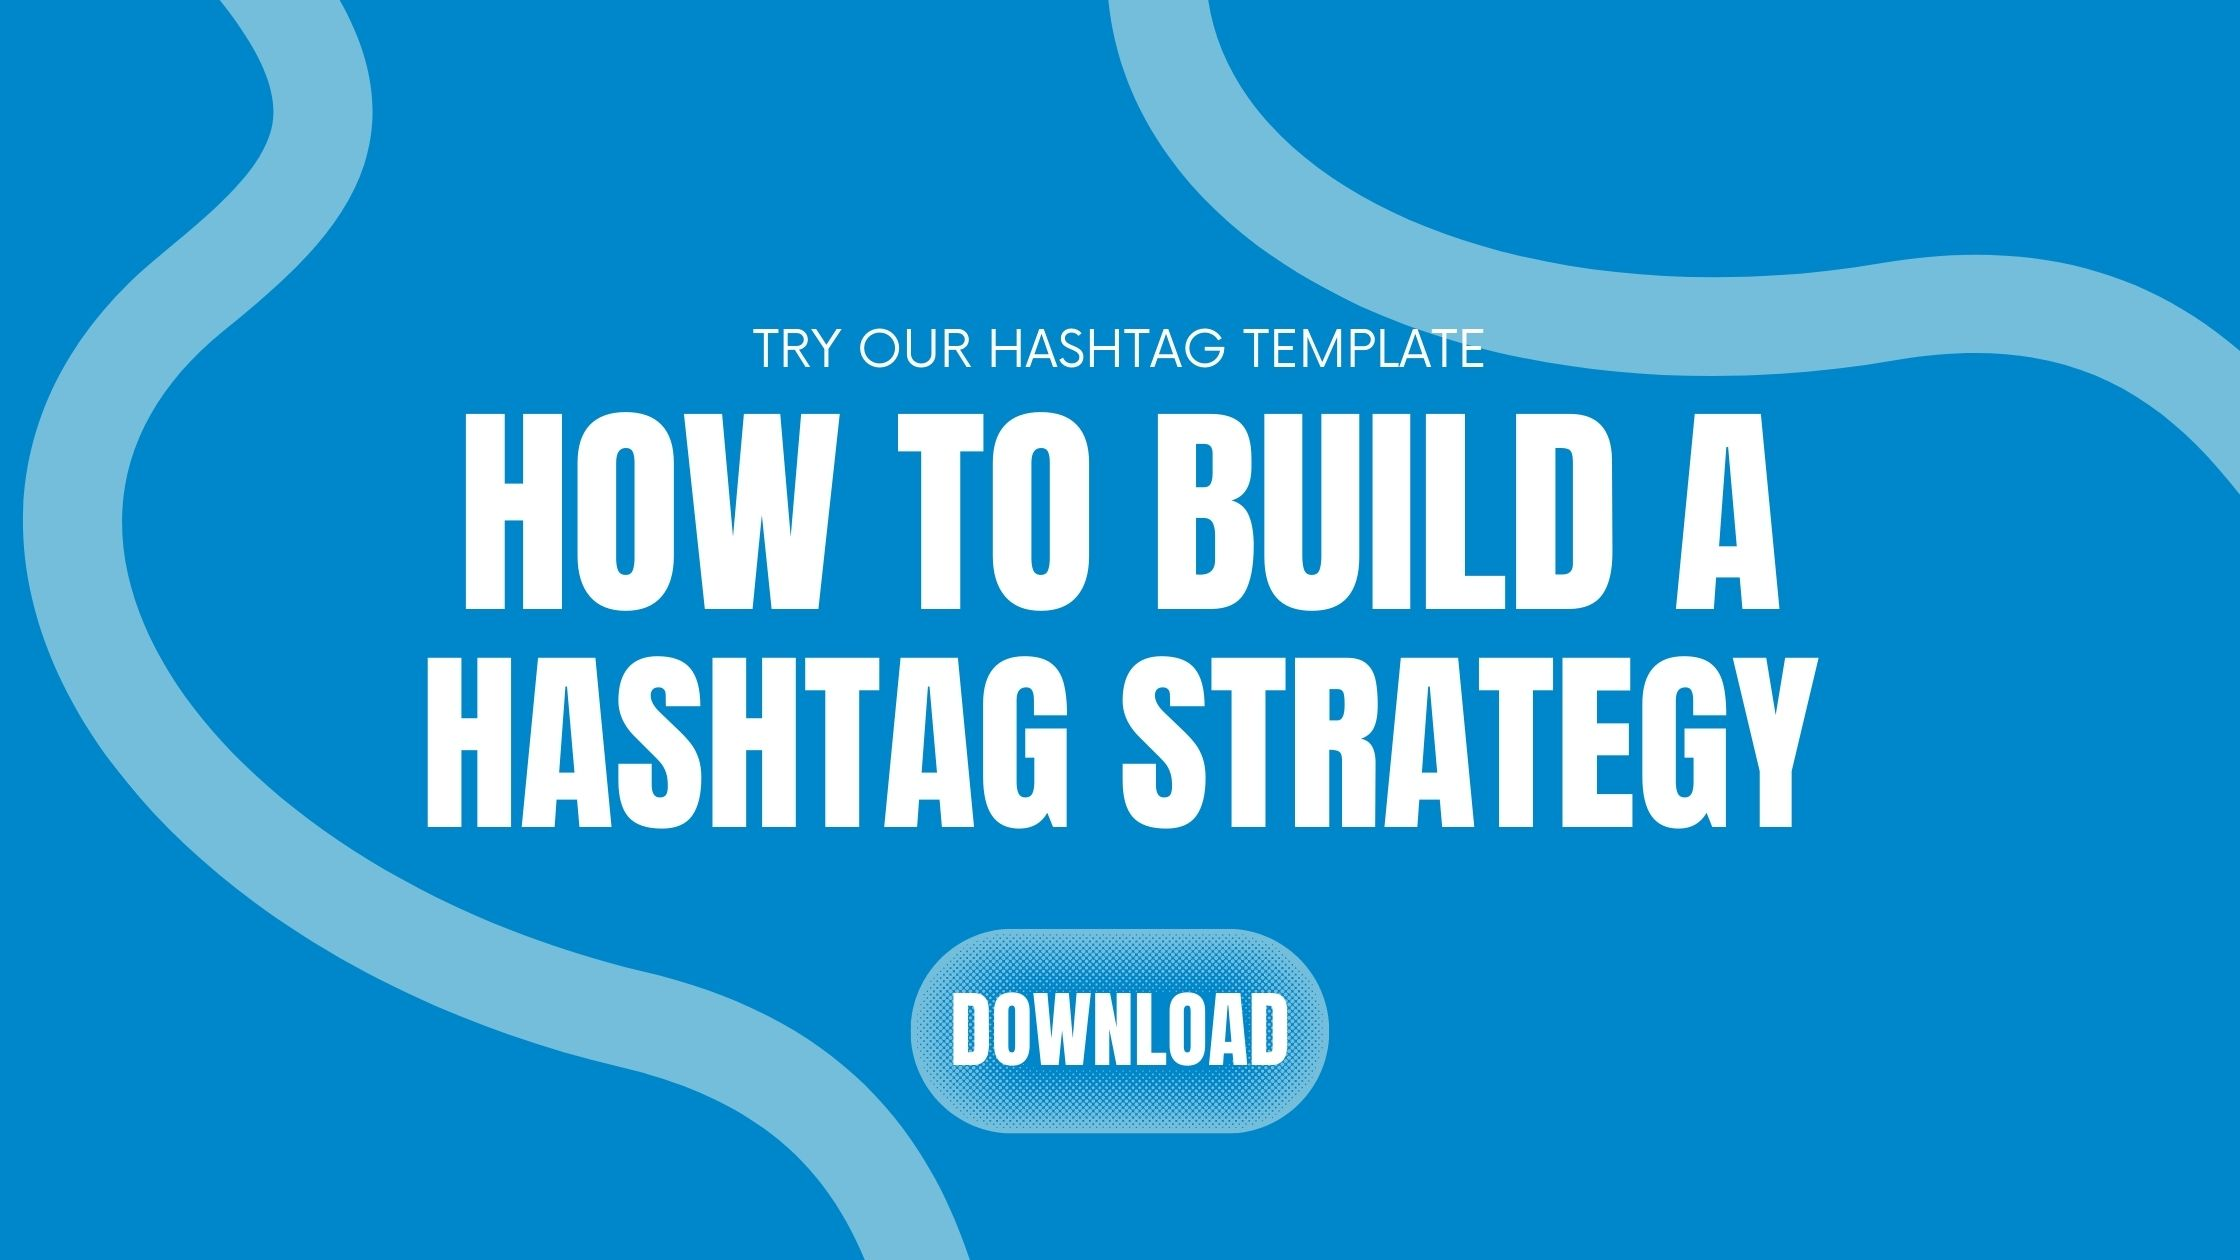 hashtag strategy jacksonville